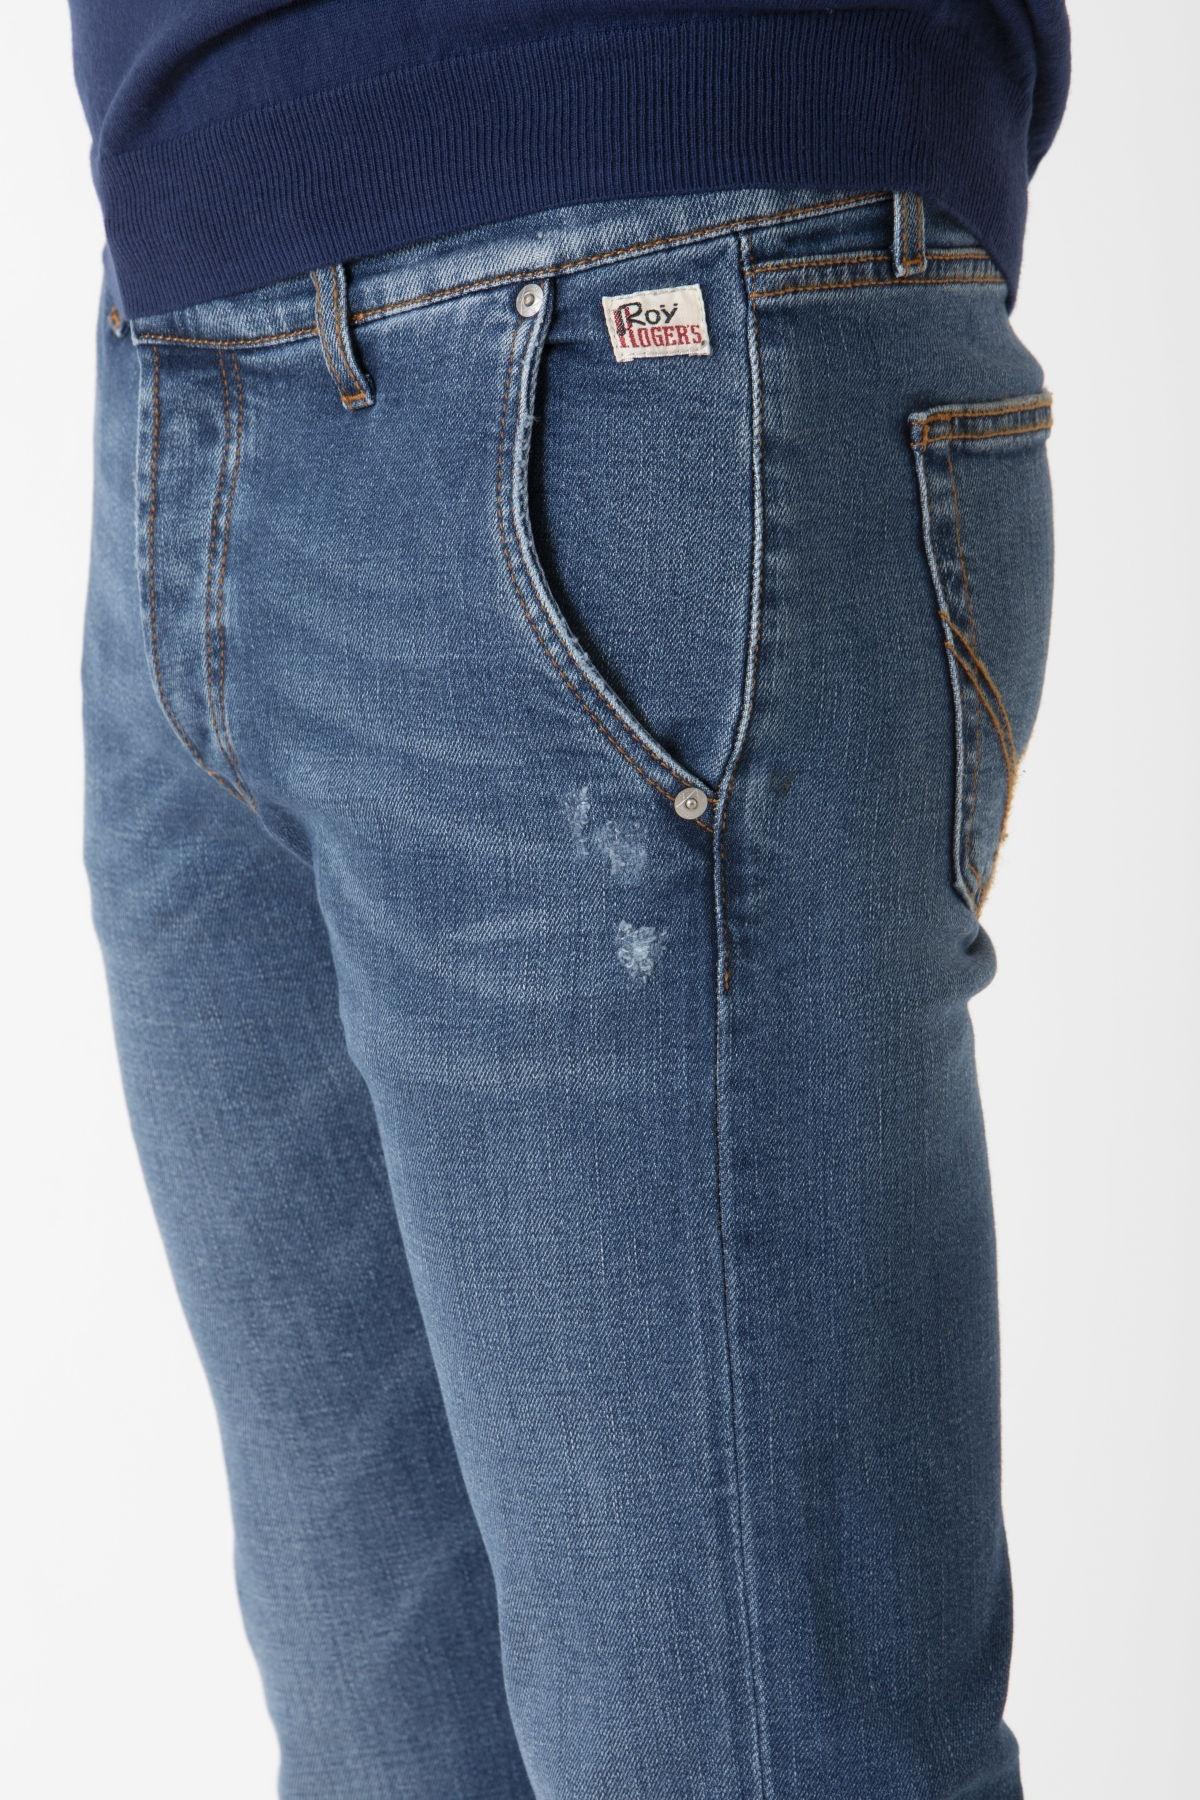 Jeans ELIAS per uomo ROY ROGER'S A/I 19-20